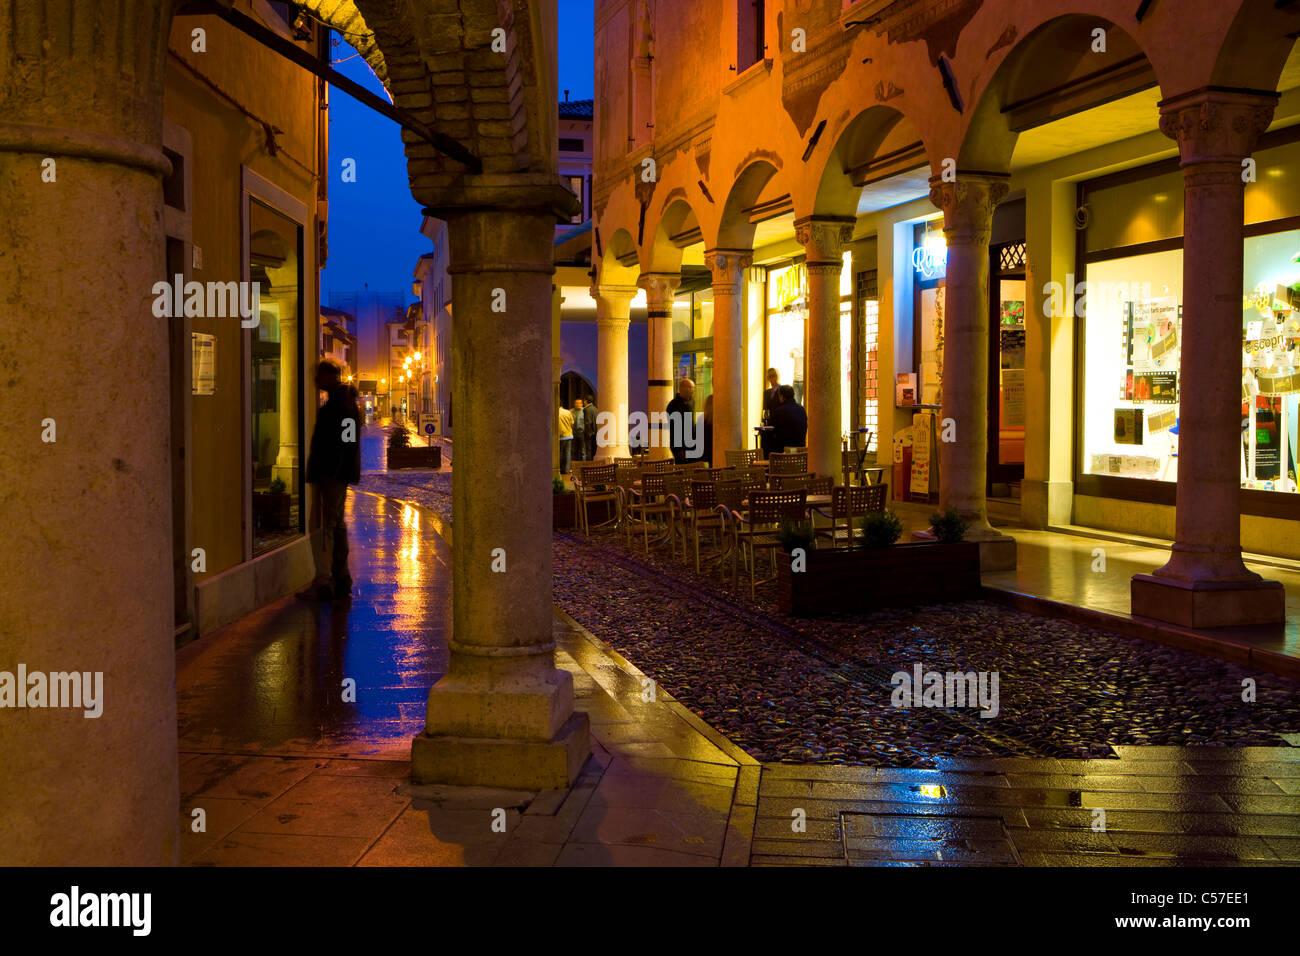 spilimbergo italy europe friuli venezia giulia town city dusk stock photo 37659049 alamy. Black Bedroom Furniture Sets. Home Design Ideas